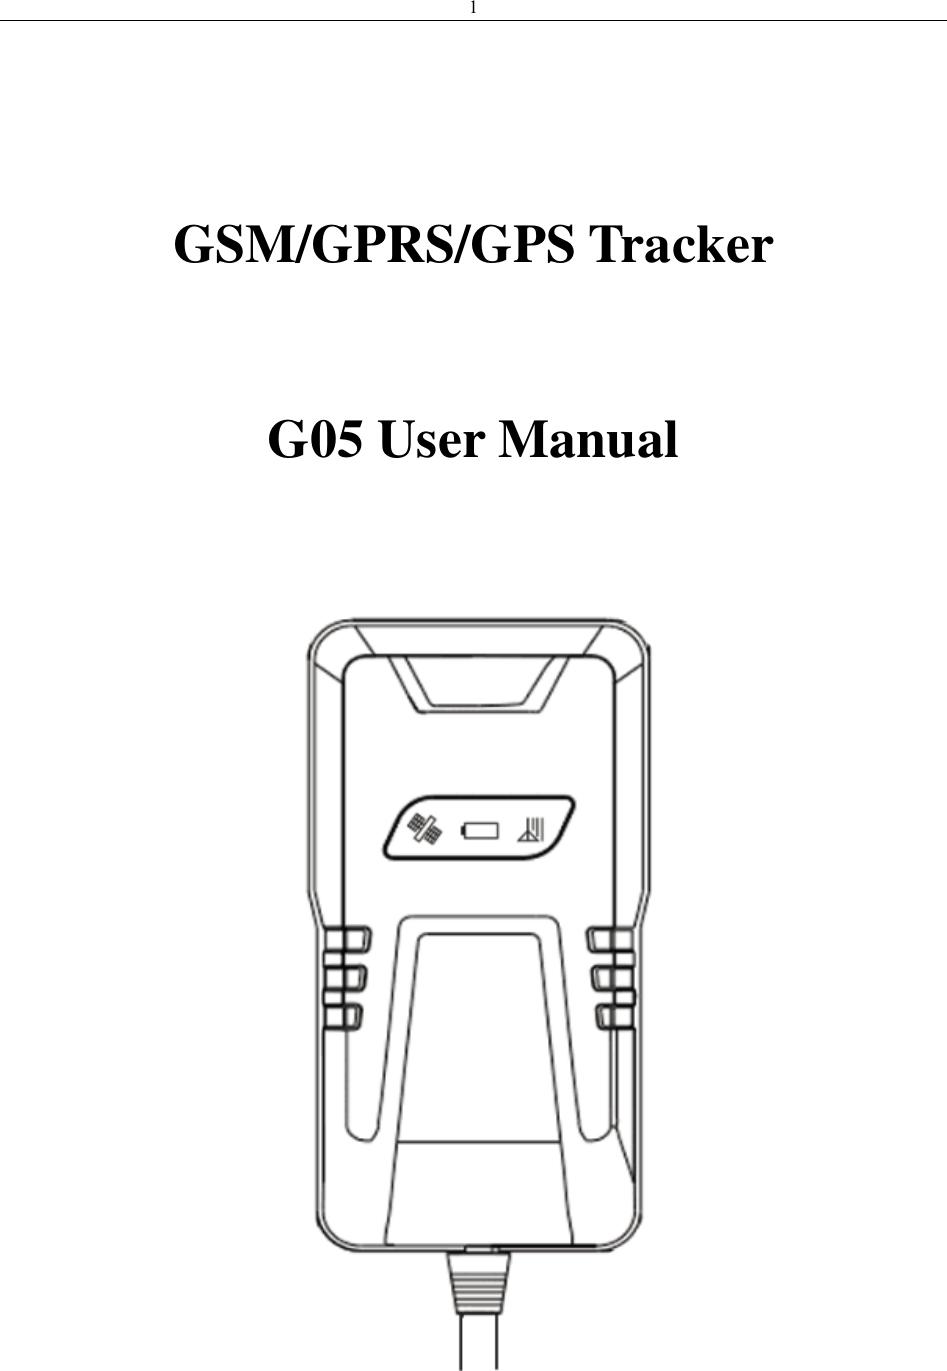 Gt005 Gps Tracker User Manual